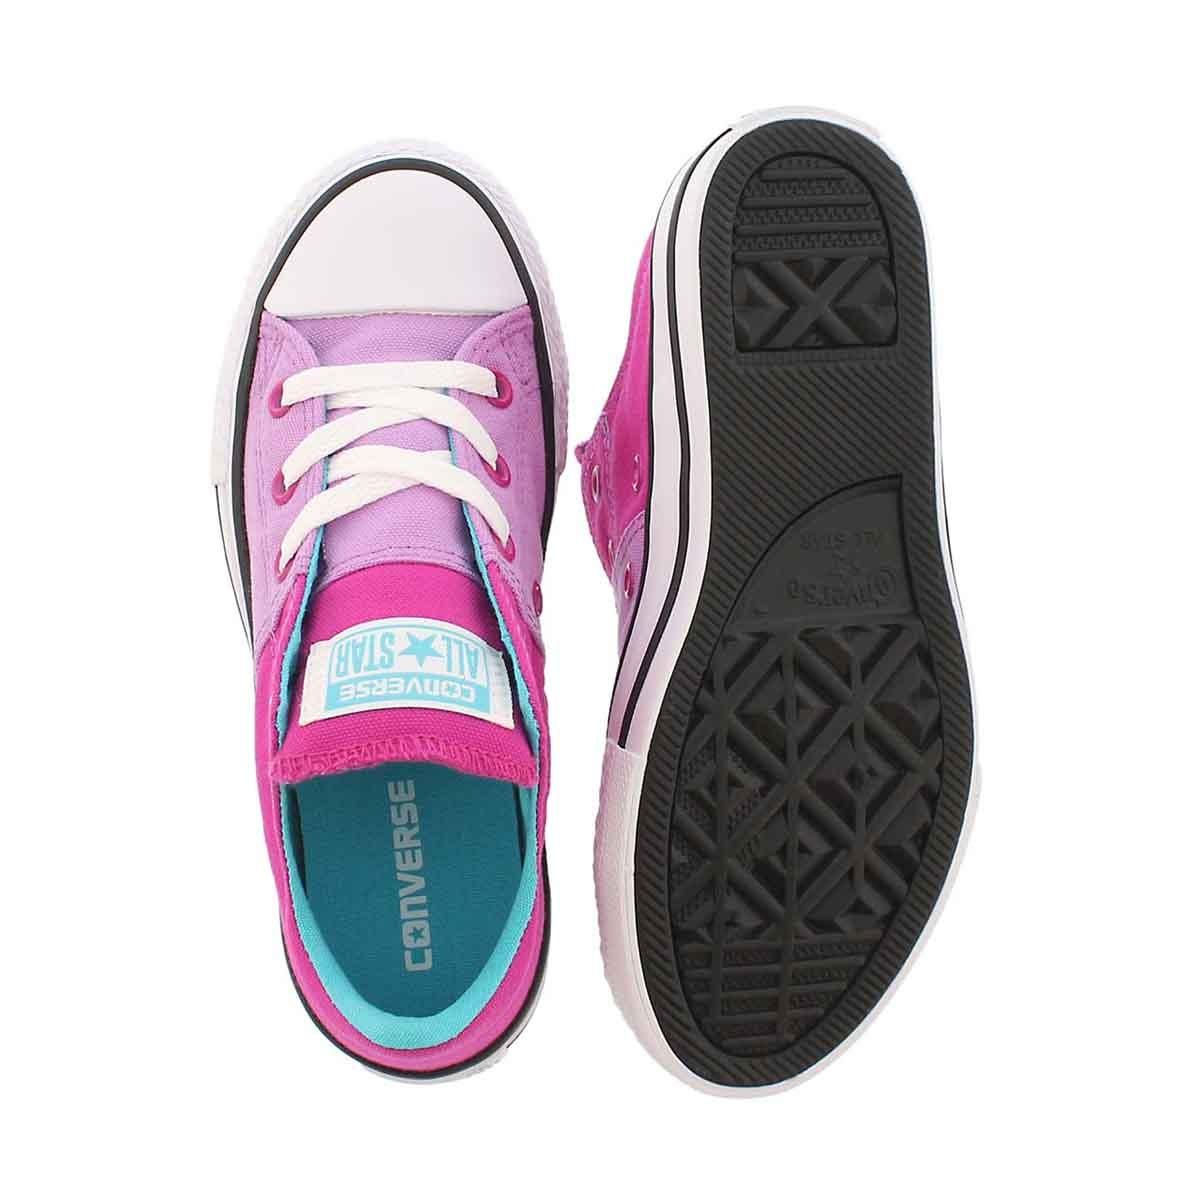 Grls CTAS Madison fuchsia/mgnta sneaker